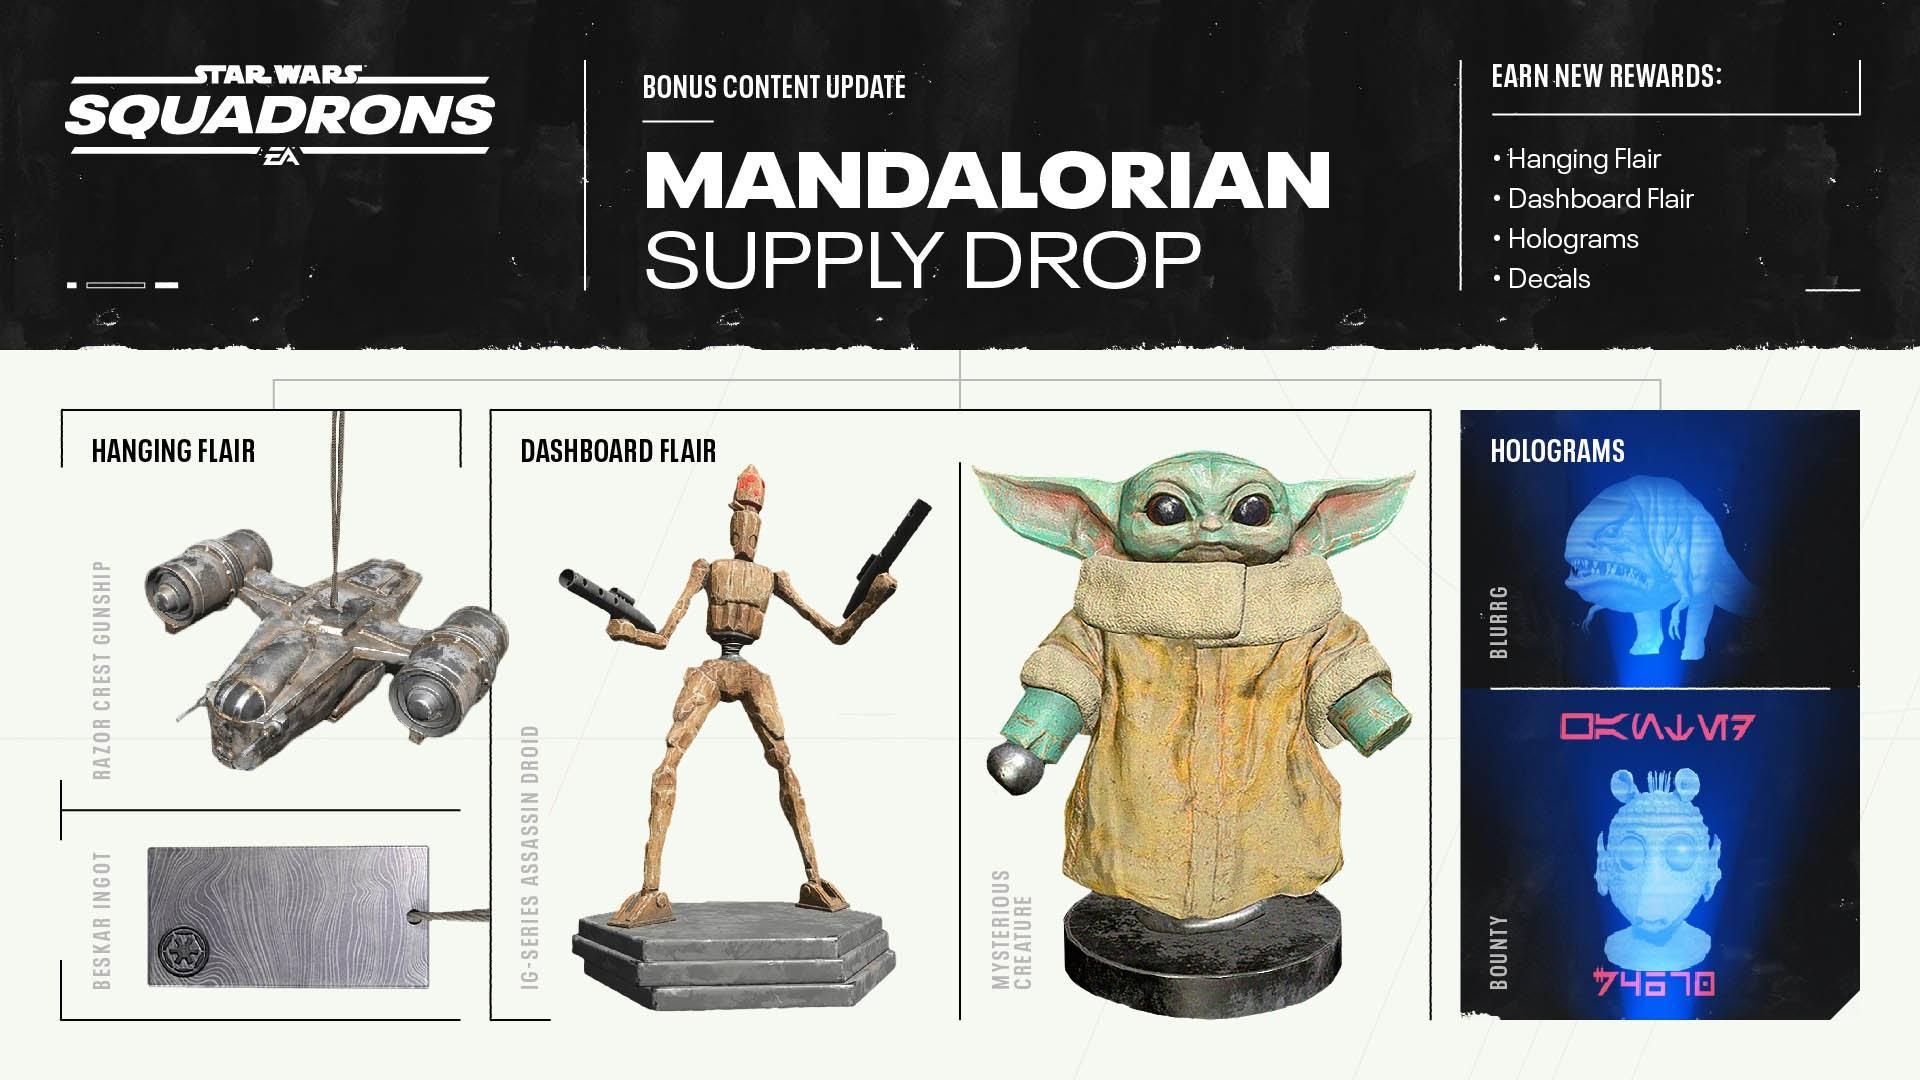 Star Wars: Squadrons The Mandalorian DLC